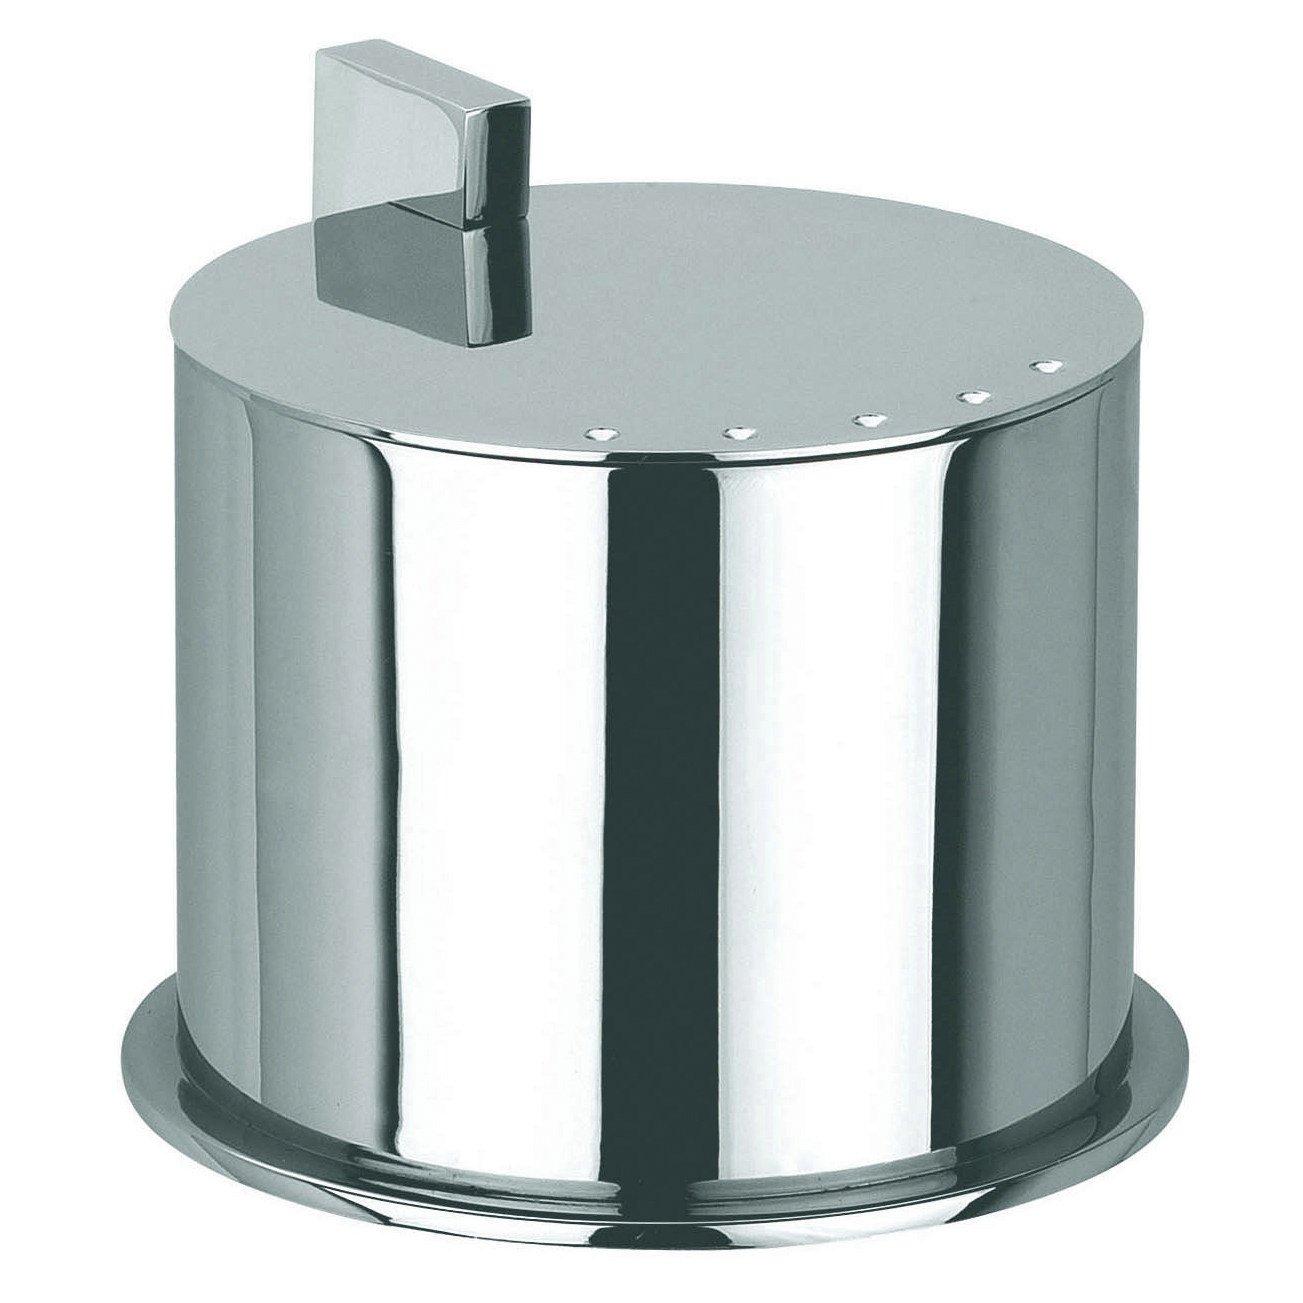 Ginger Kubic Solid Brass Vanity Jar No. 1, Medium Size, Polished Chrome